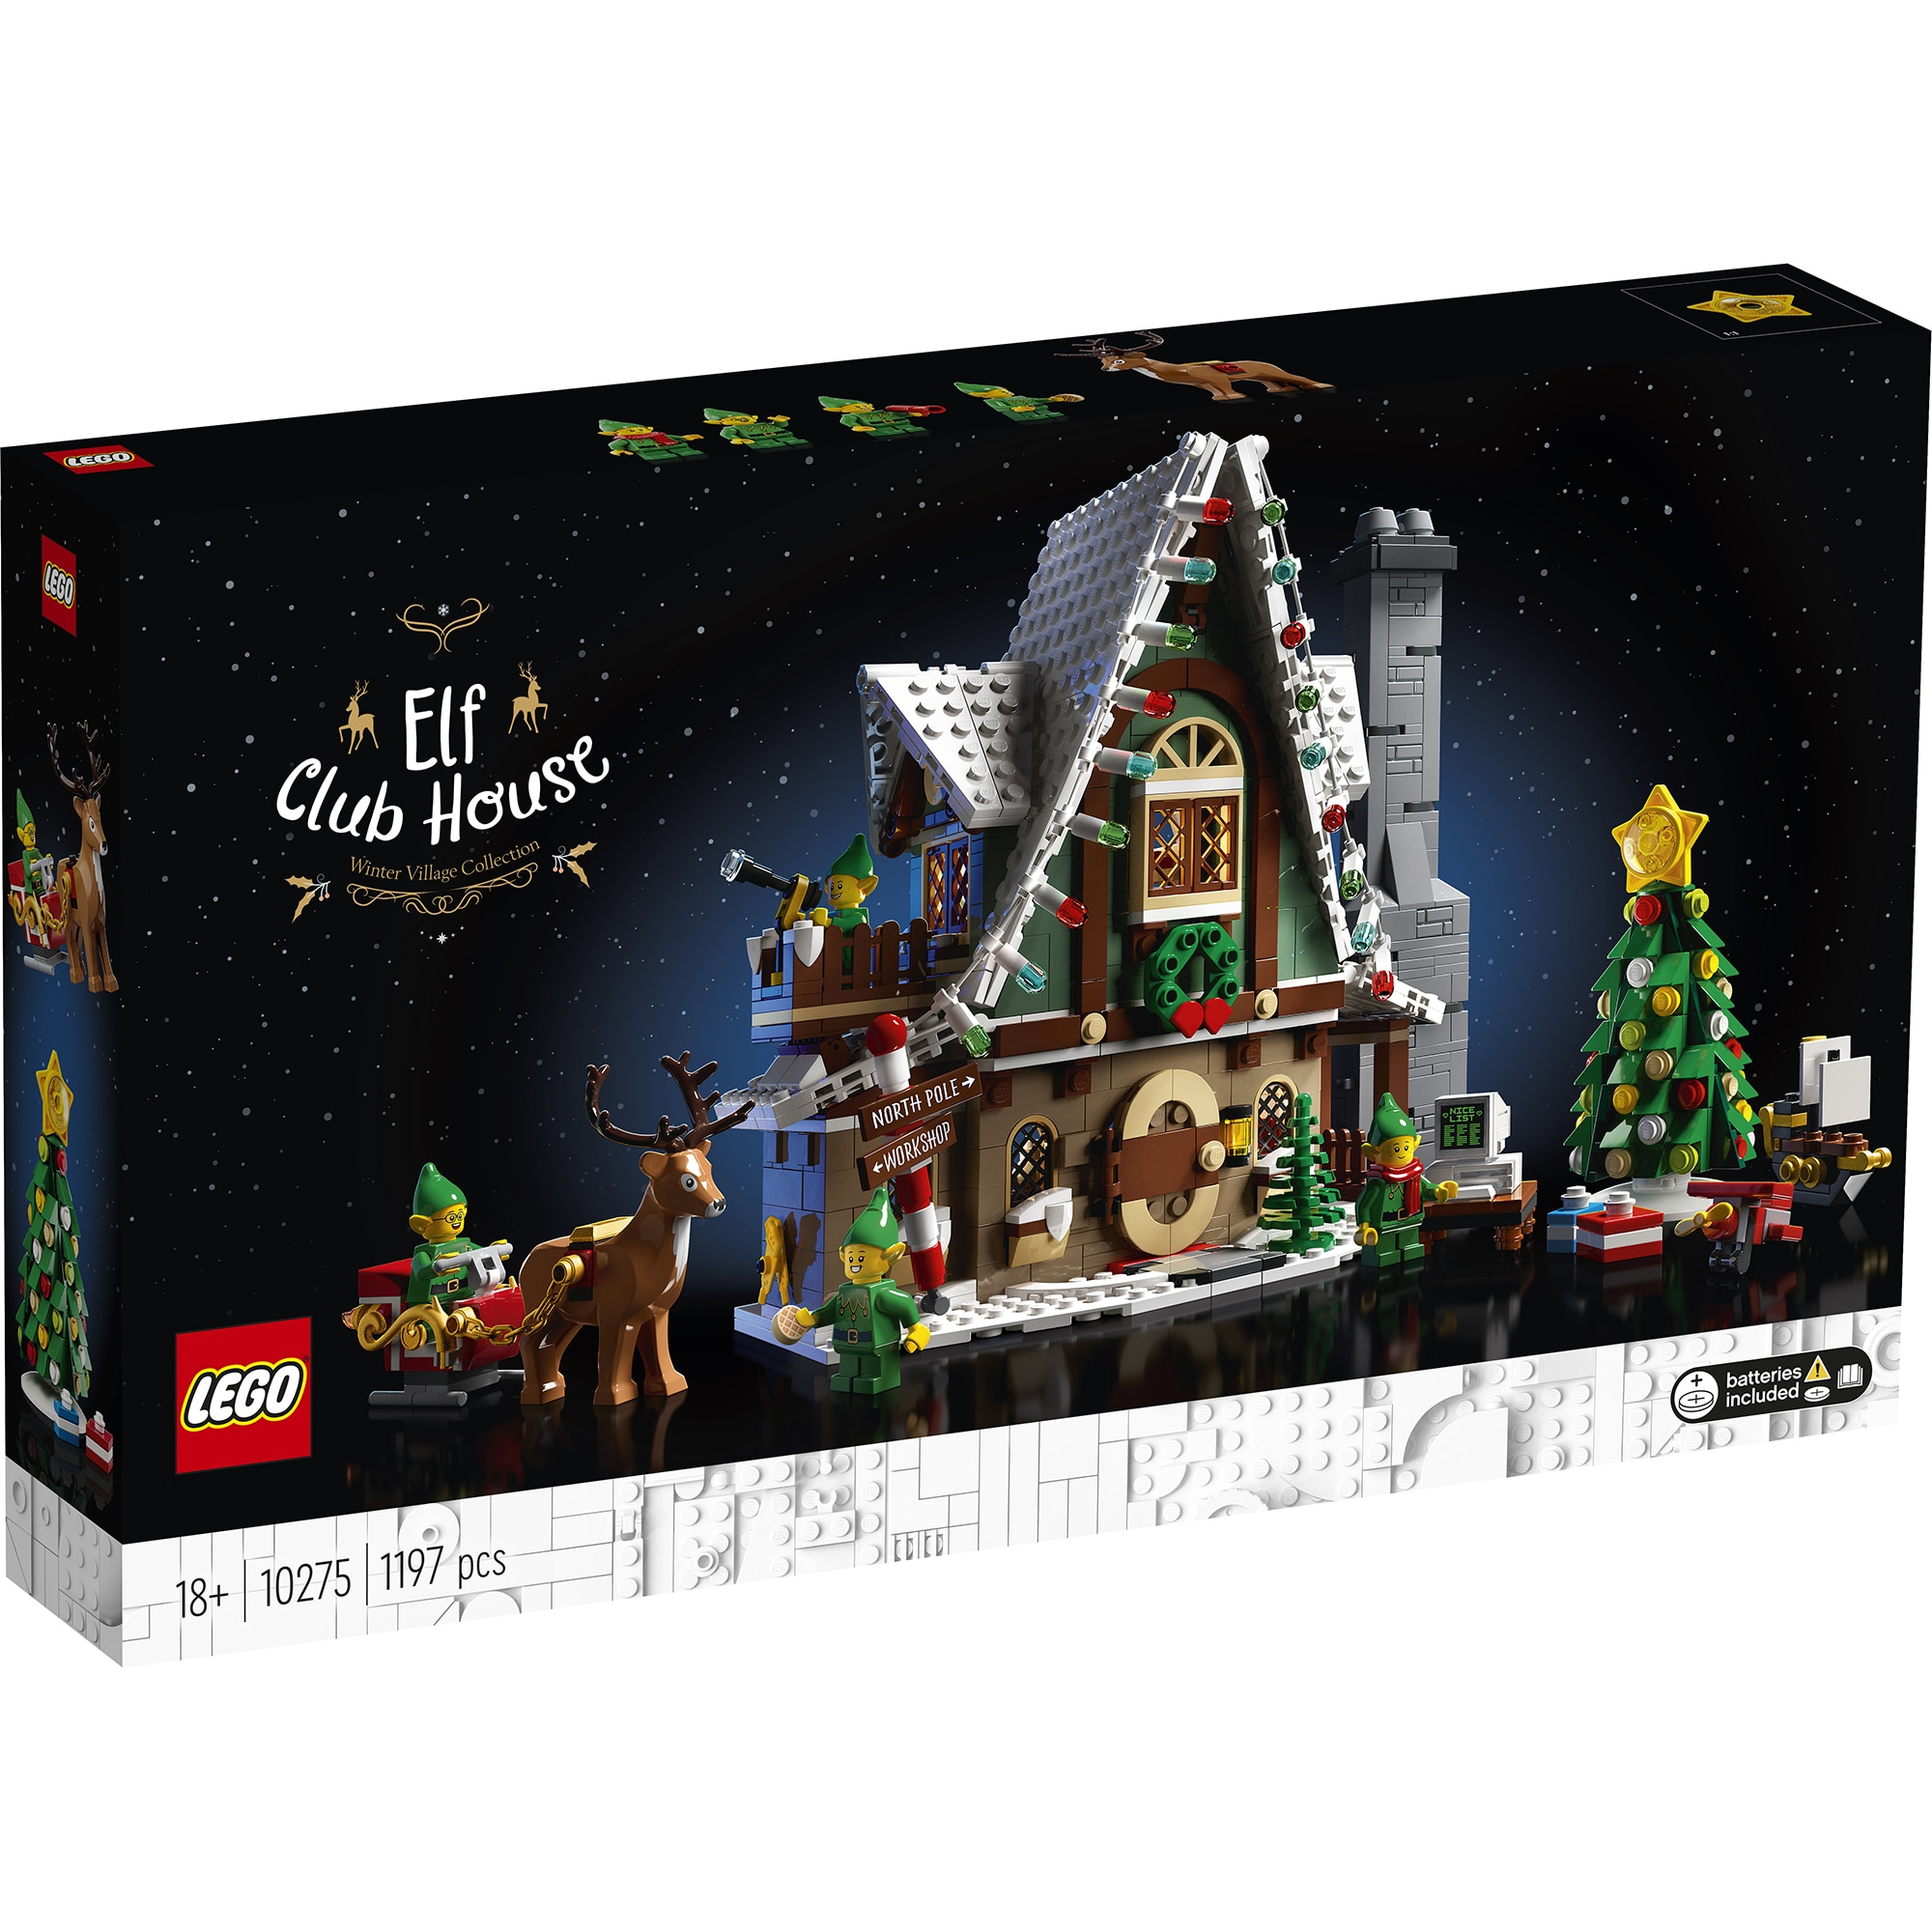 Fotografie LEGO Creator Expert - Elf Club House 10275, 1197 piese